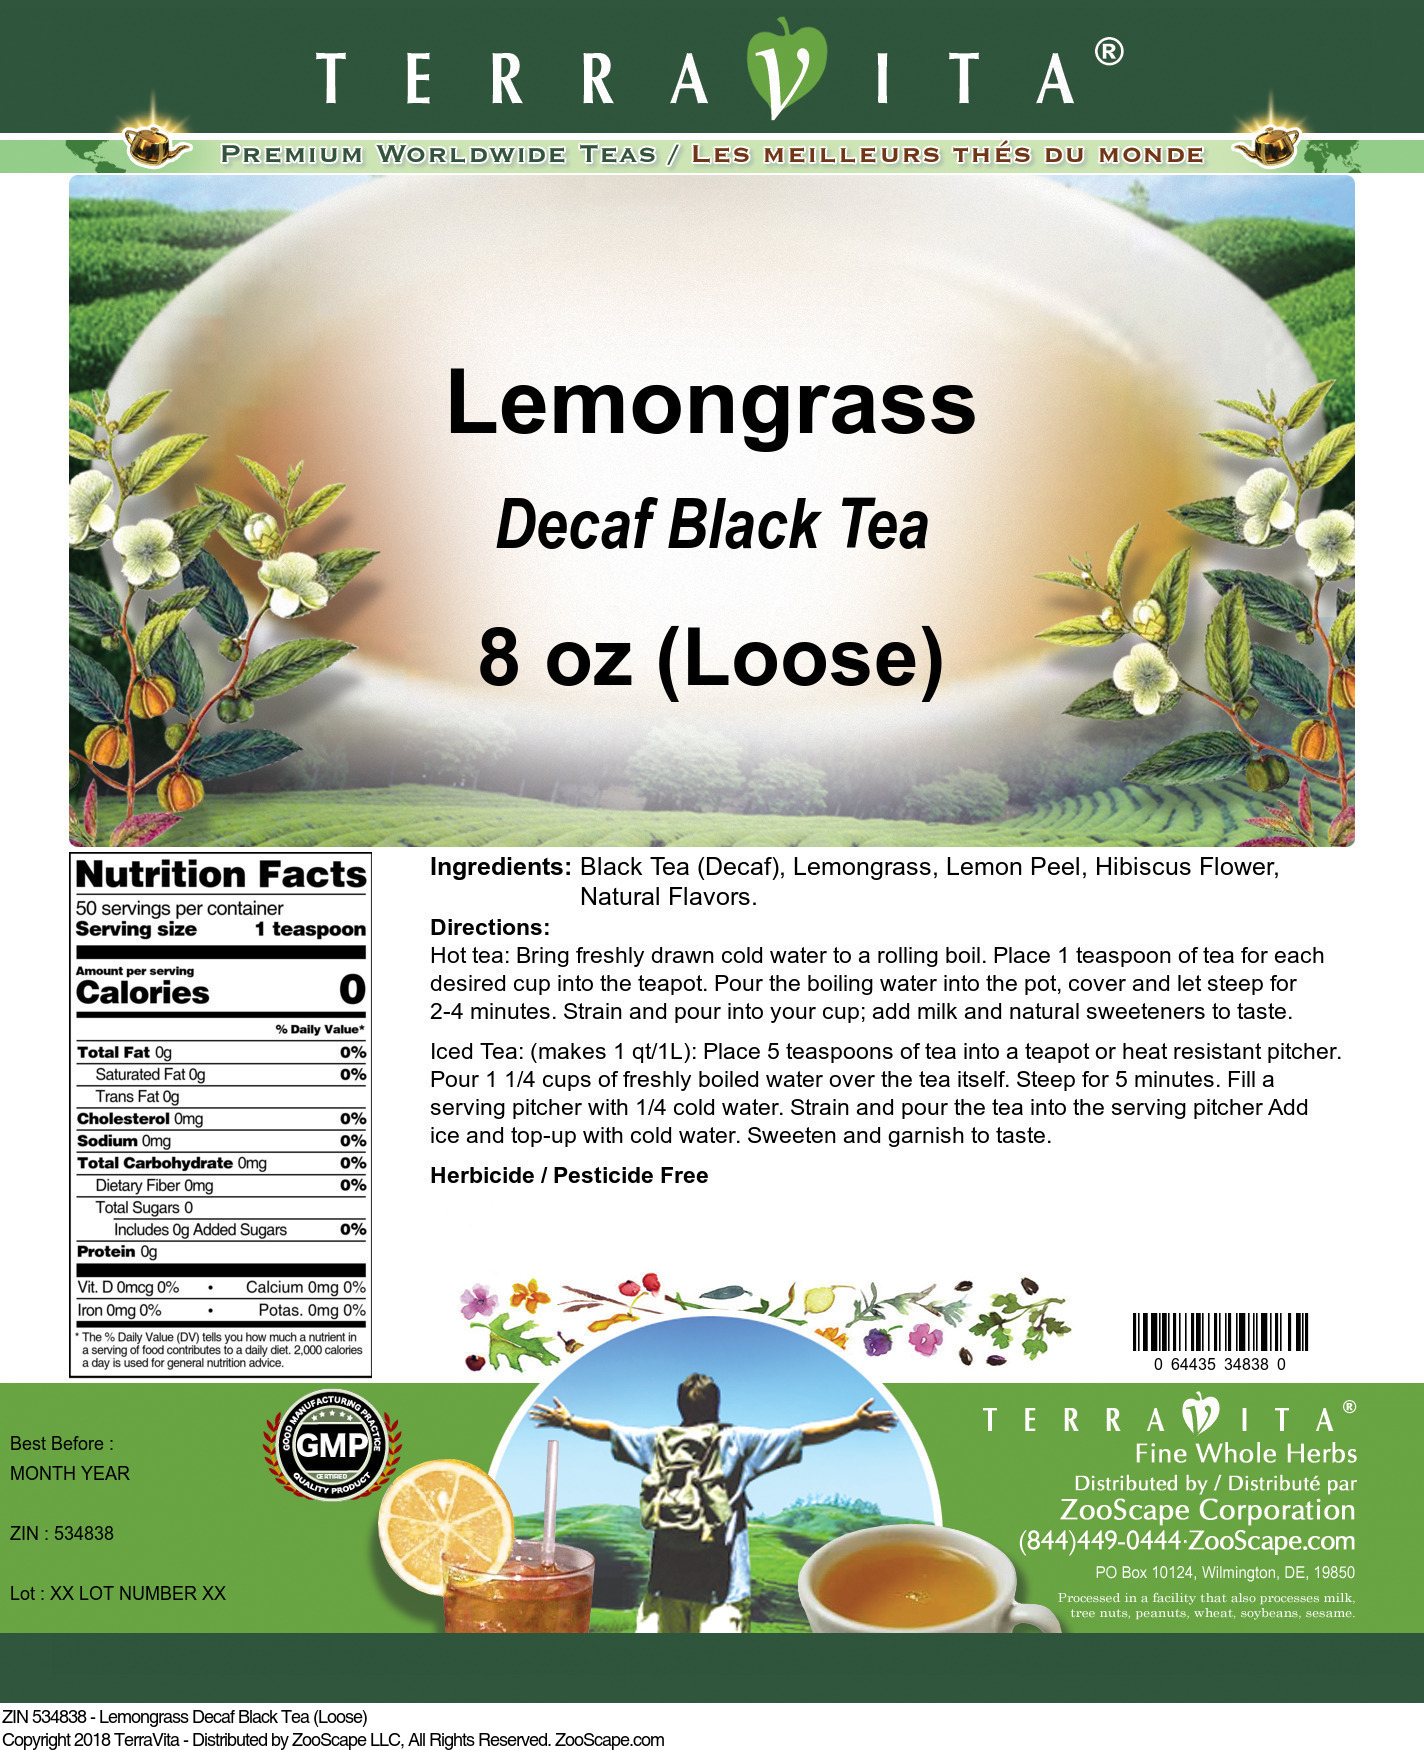 Lemongrass Decaf Black Tea